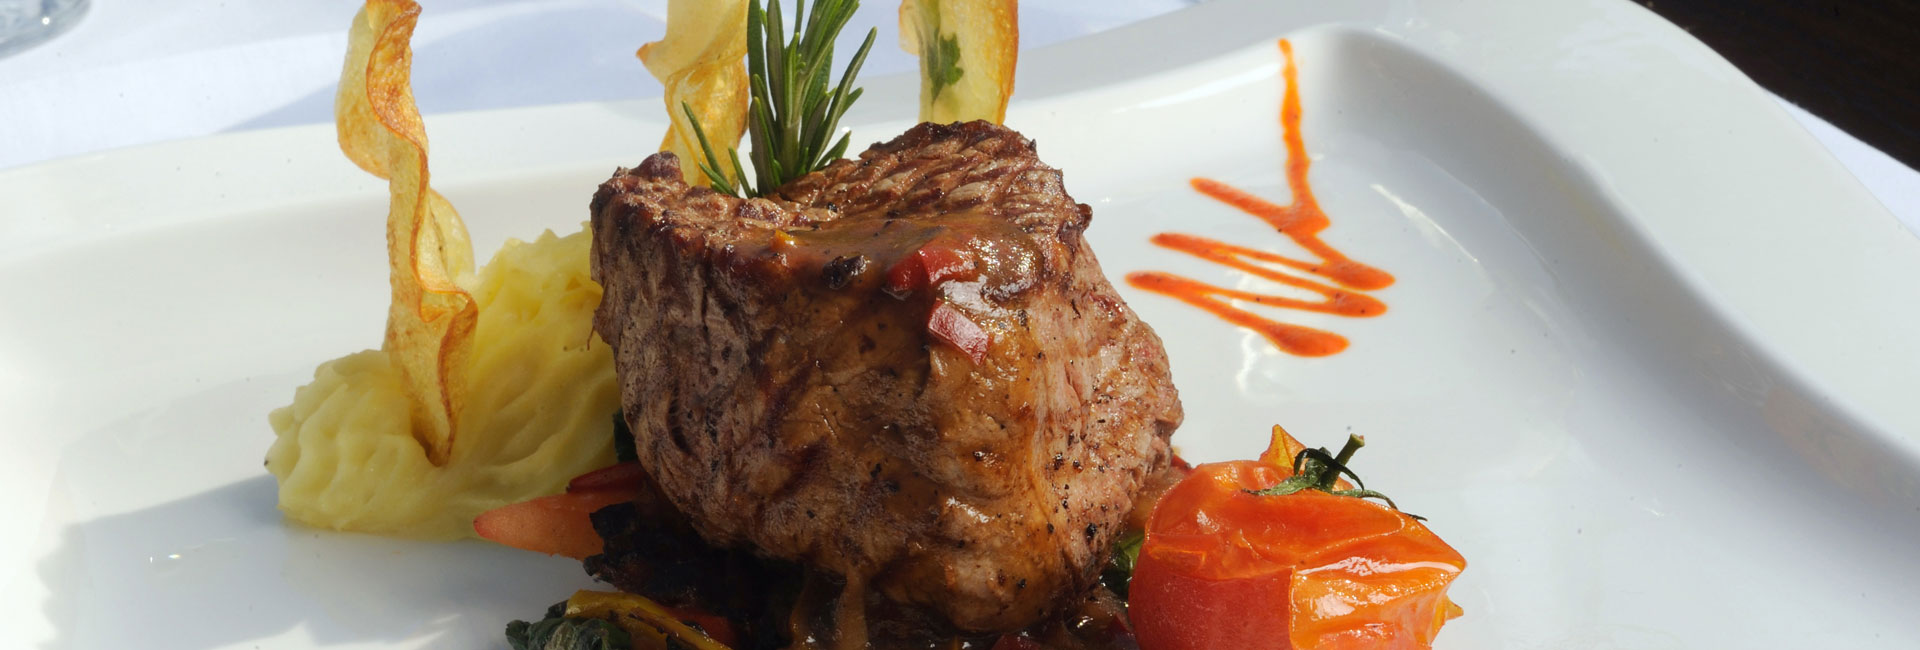 kulinarik-chalet